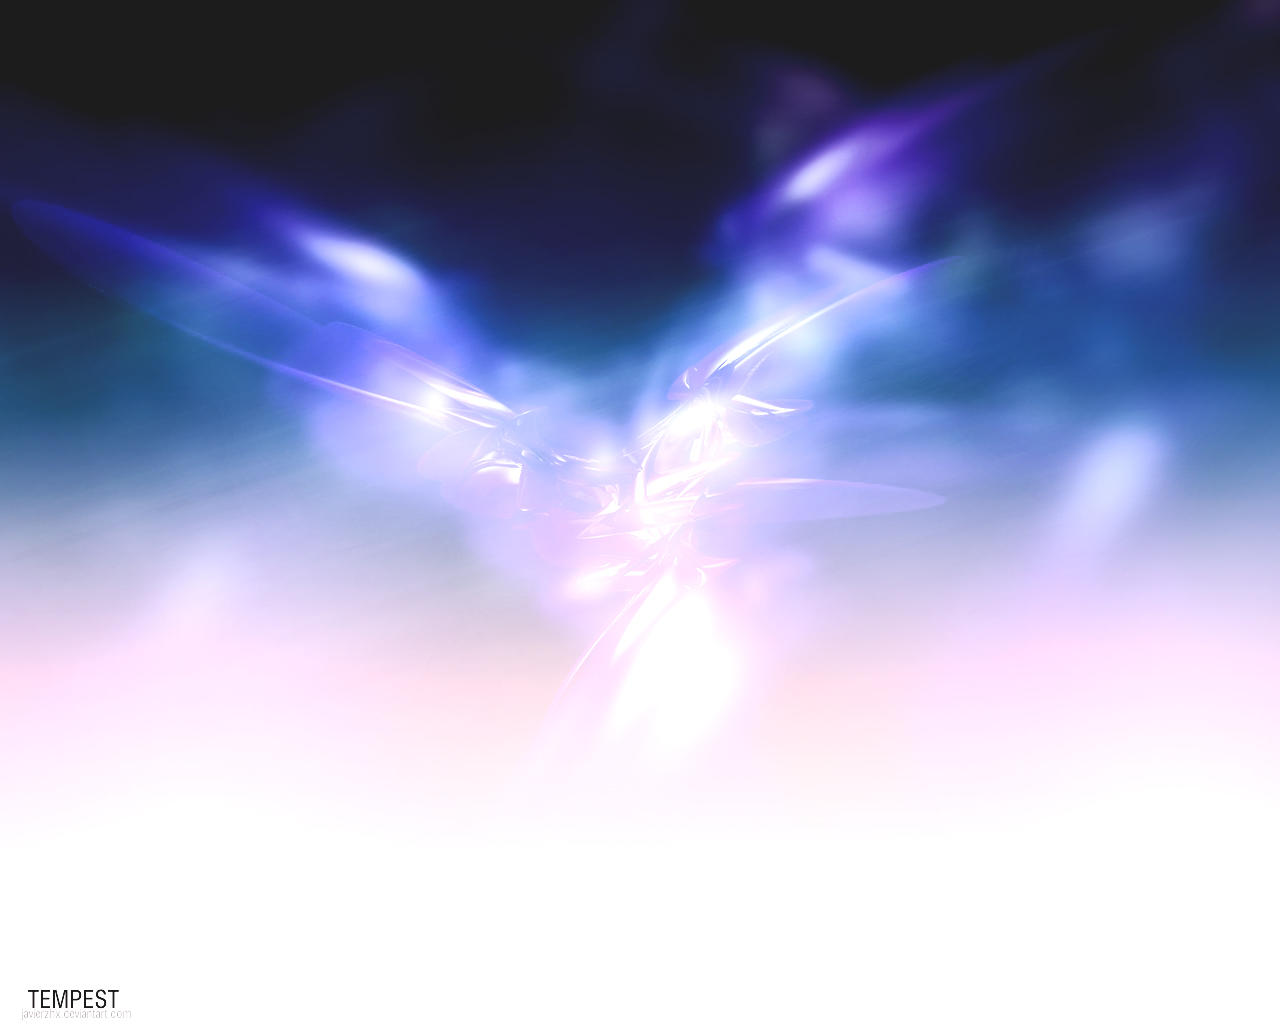 Tempest by JavierZhX